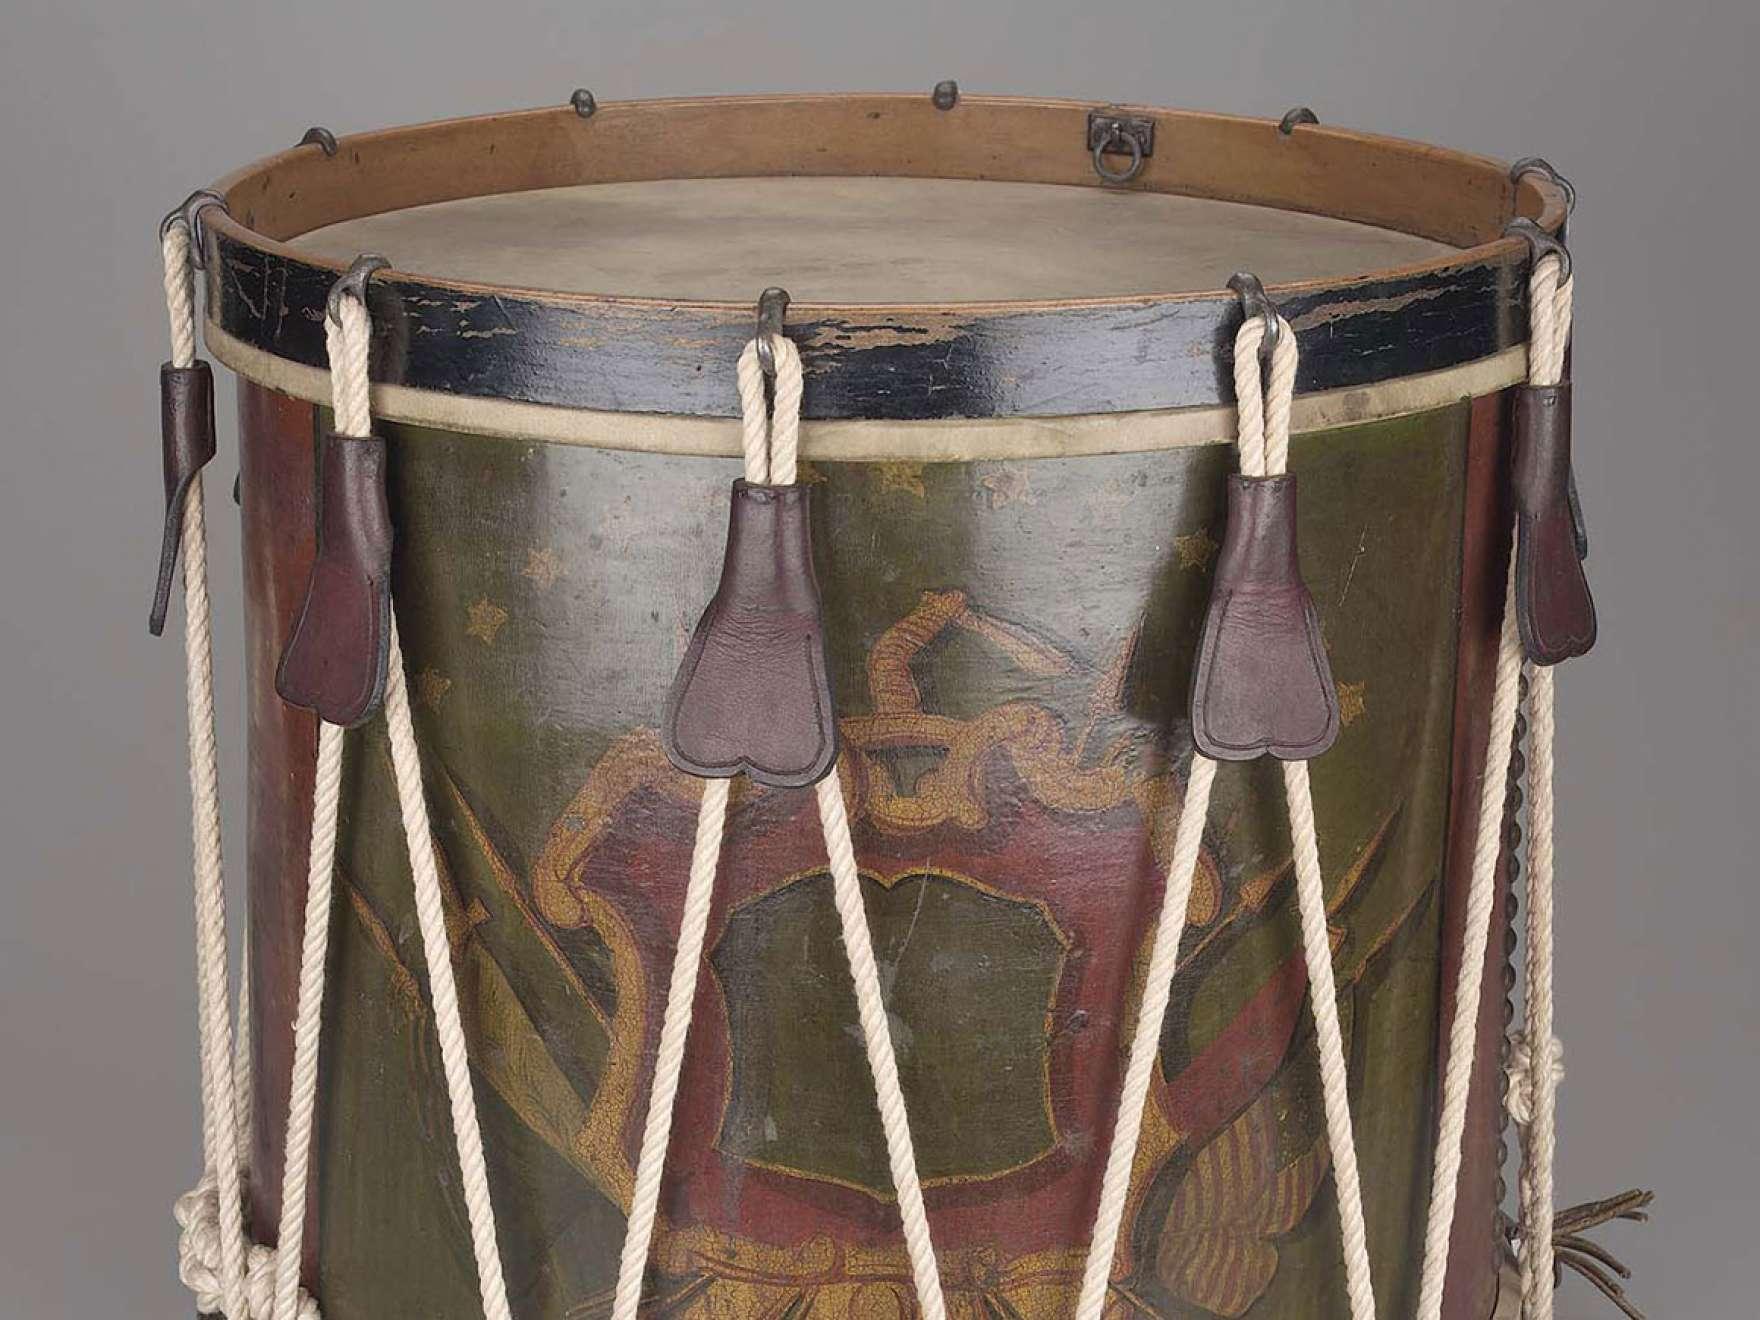 Detail of side drum